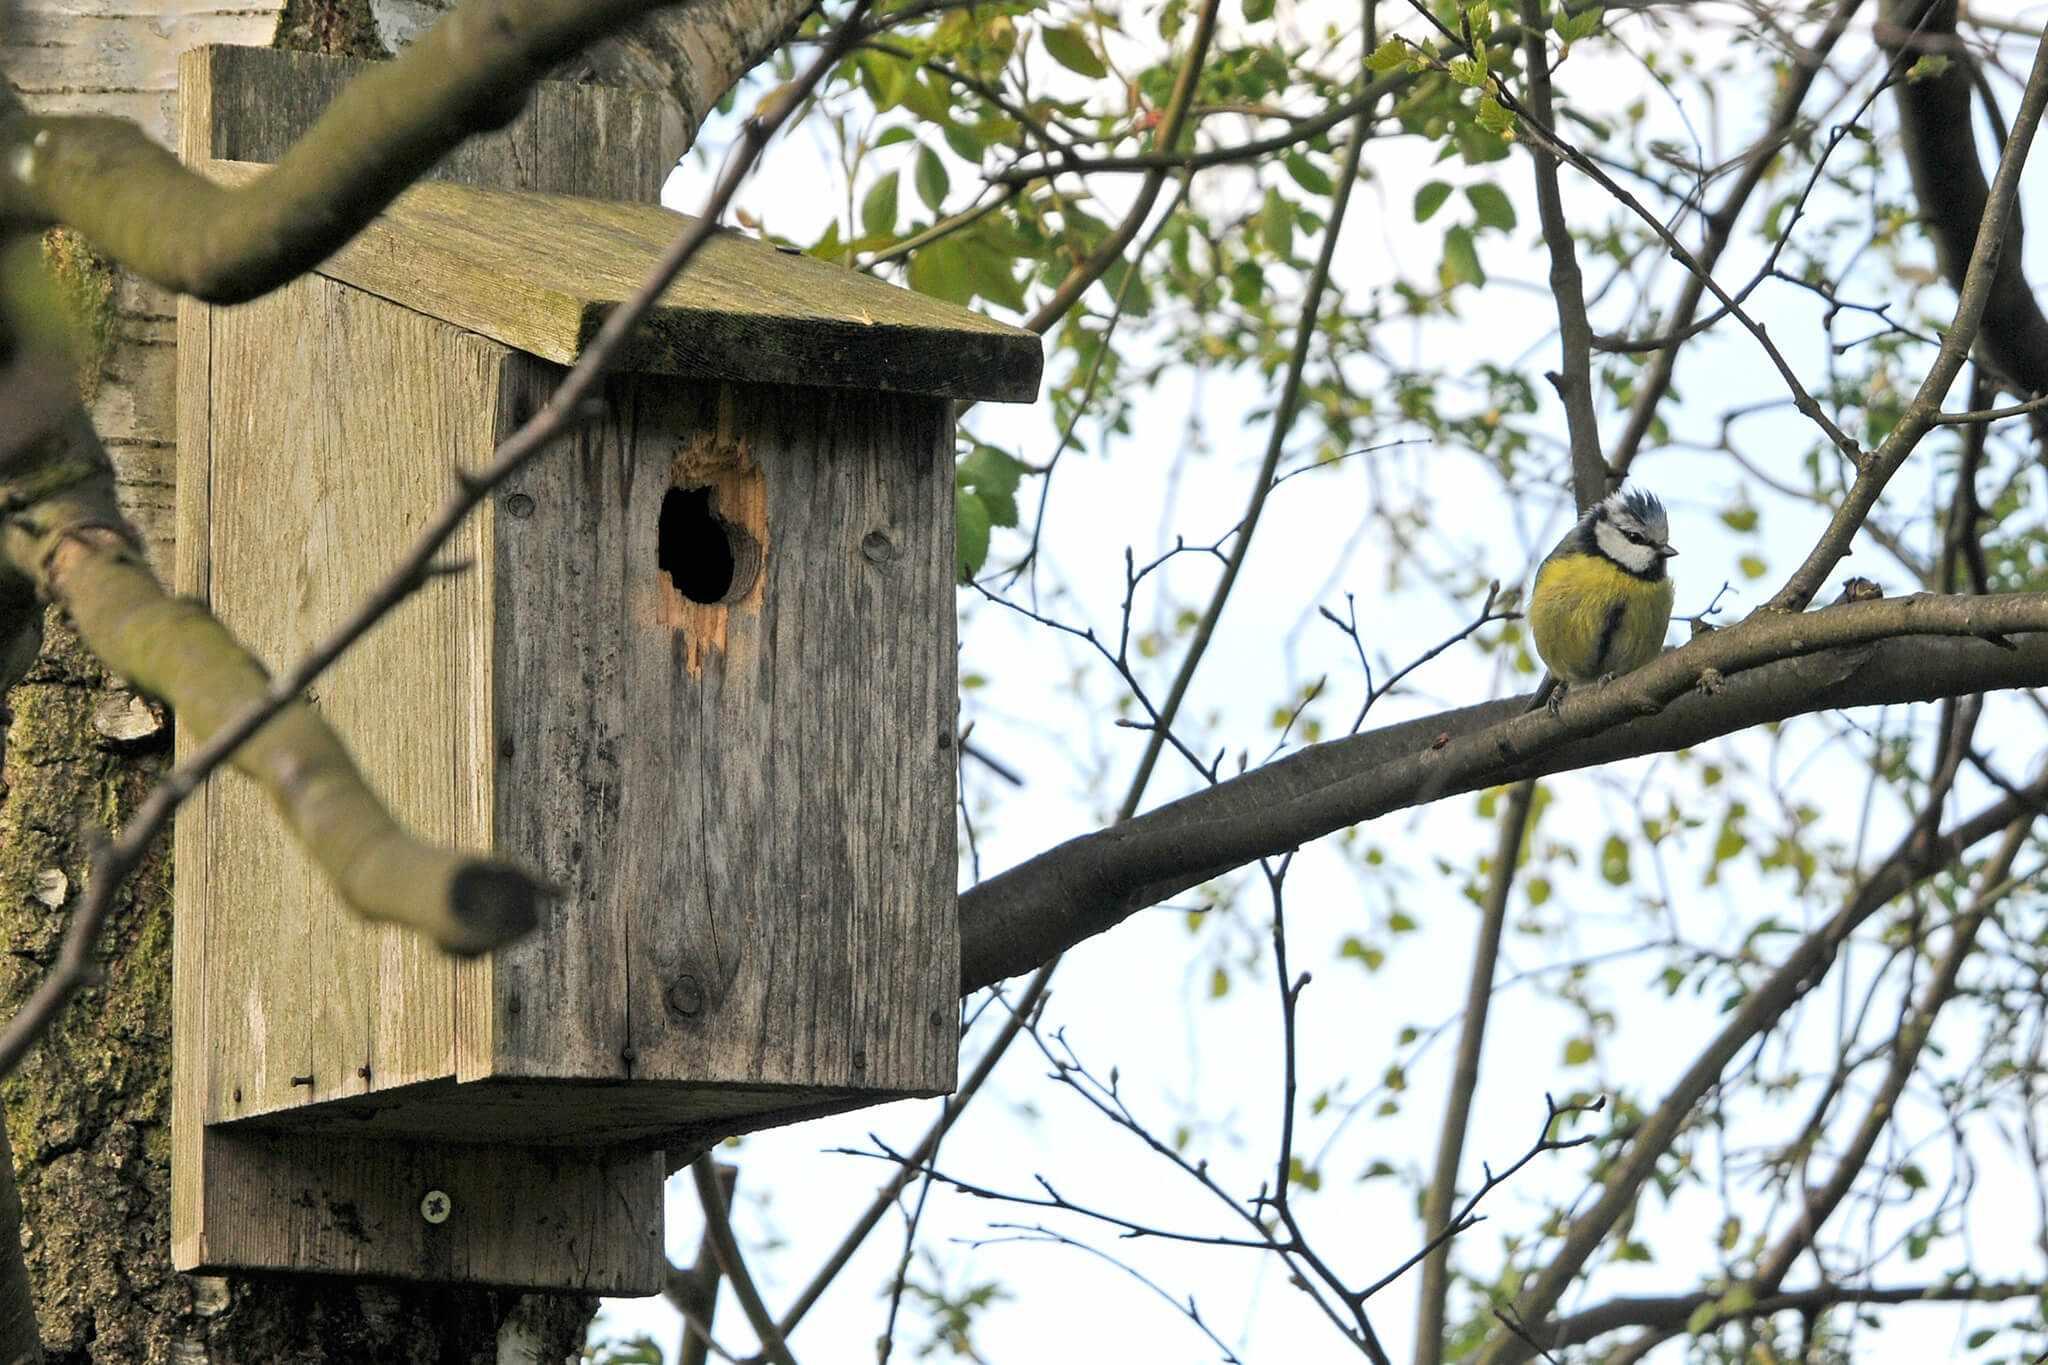 Homemade bird box